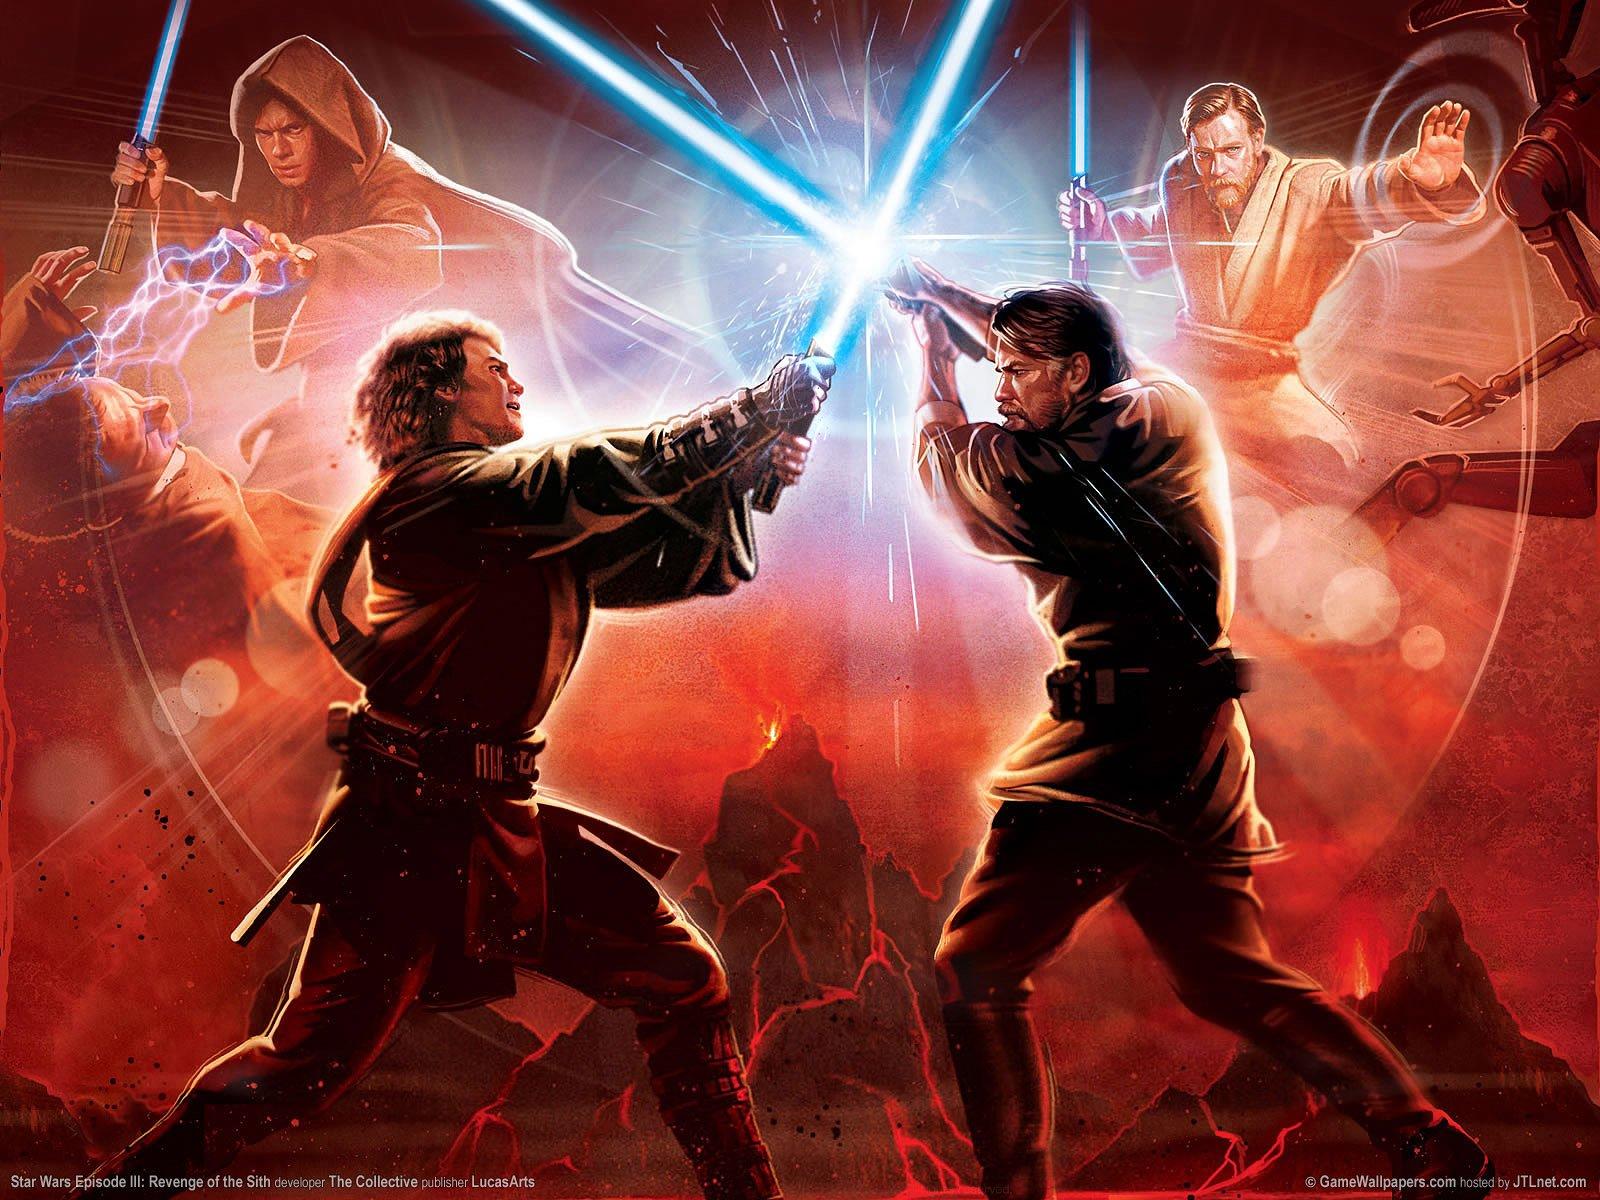 46 Star Wars Episode 3 Wallpapers On Wallpapersafari